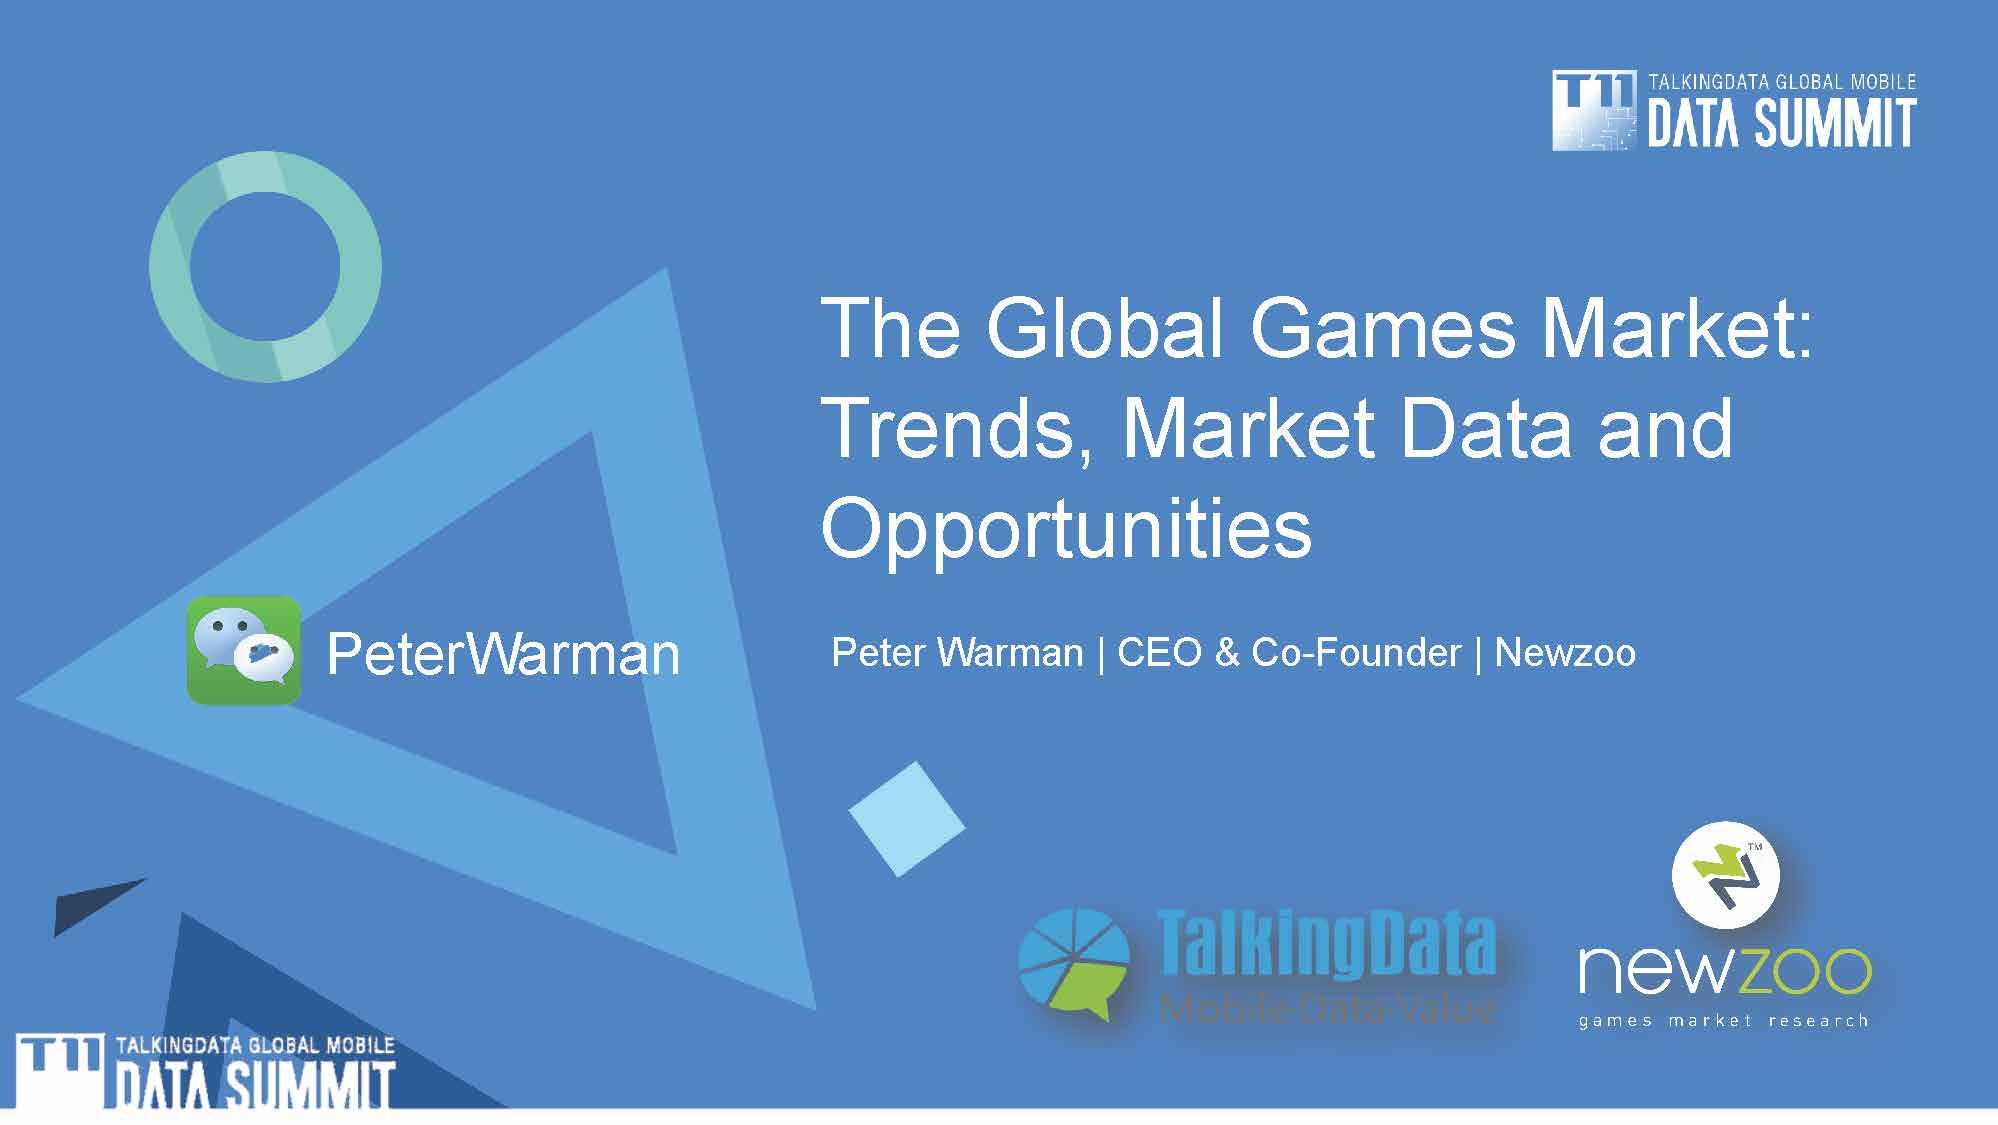 Peter Warman-透析全球数字娱乐市场